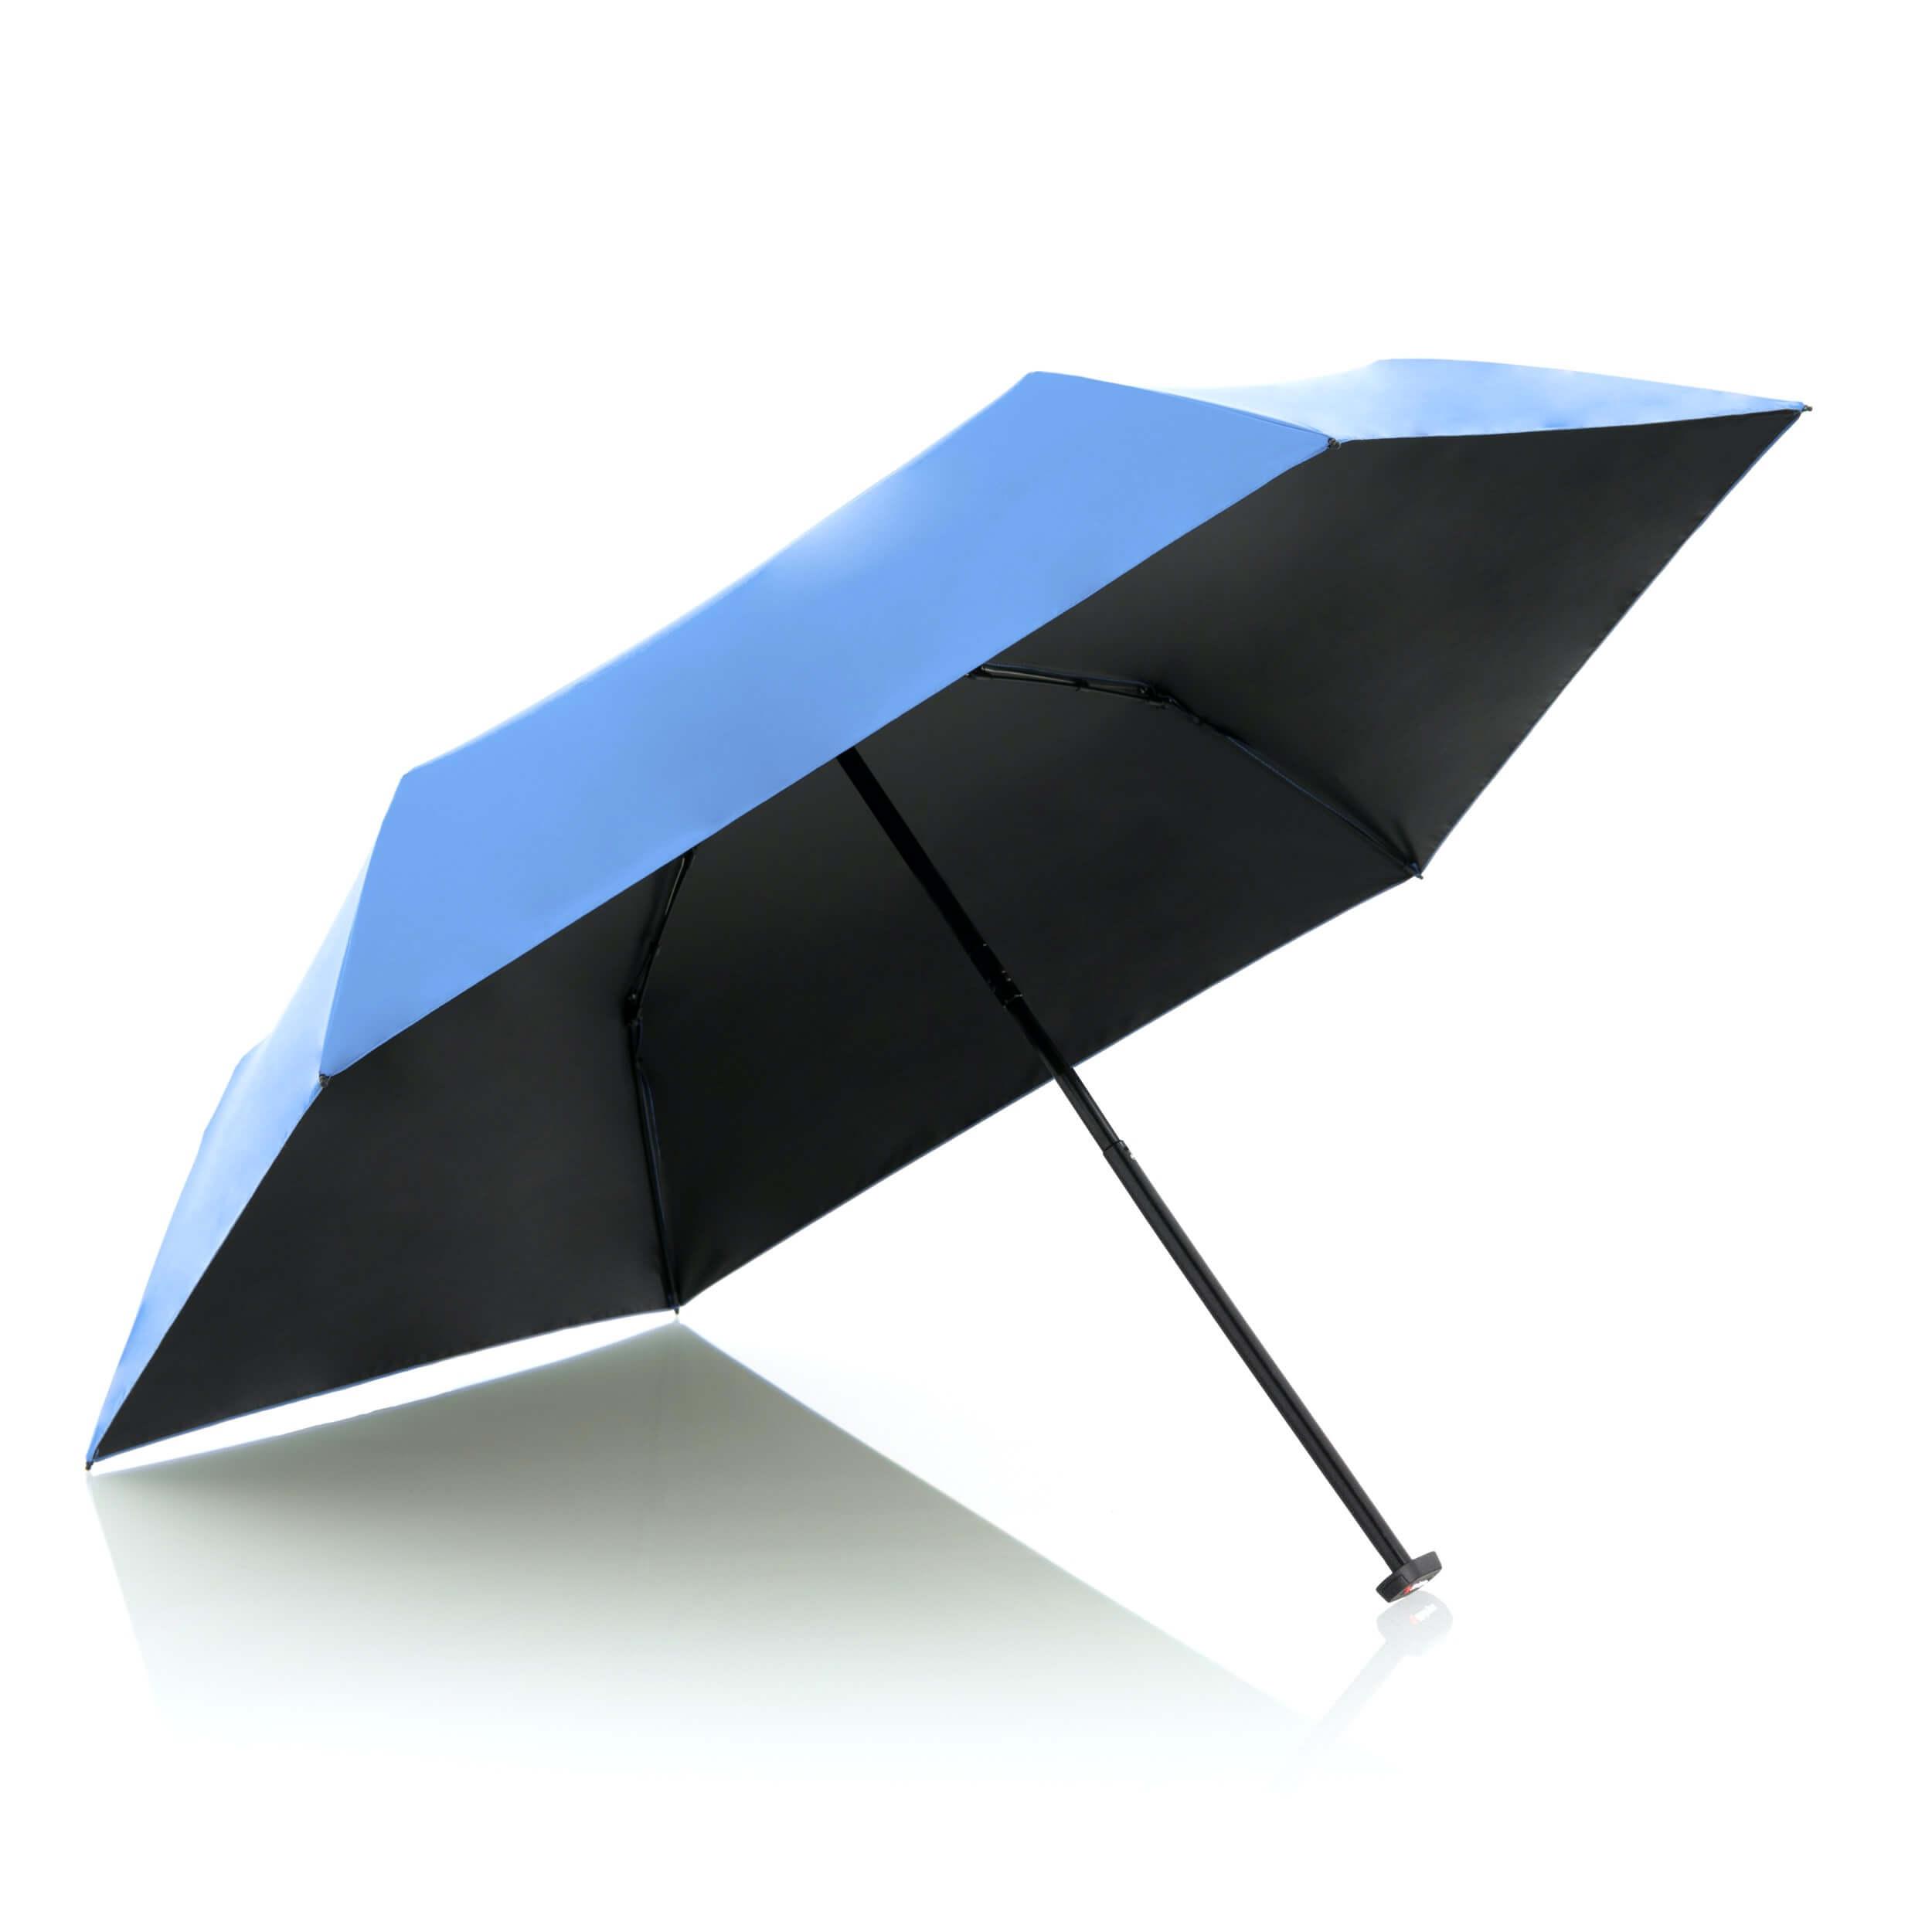 Knirps Paraplu Ultra Light Slim Blue with Black